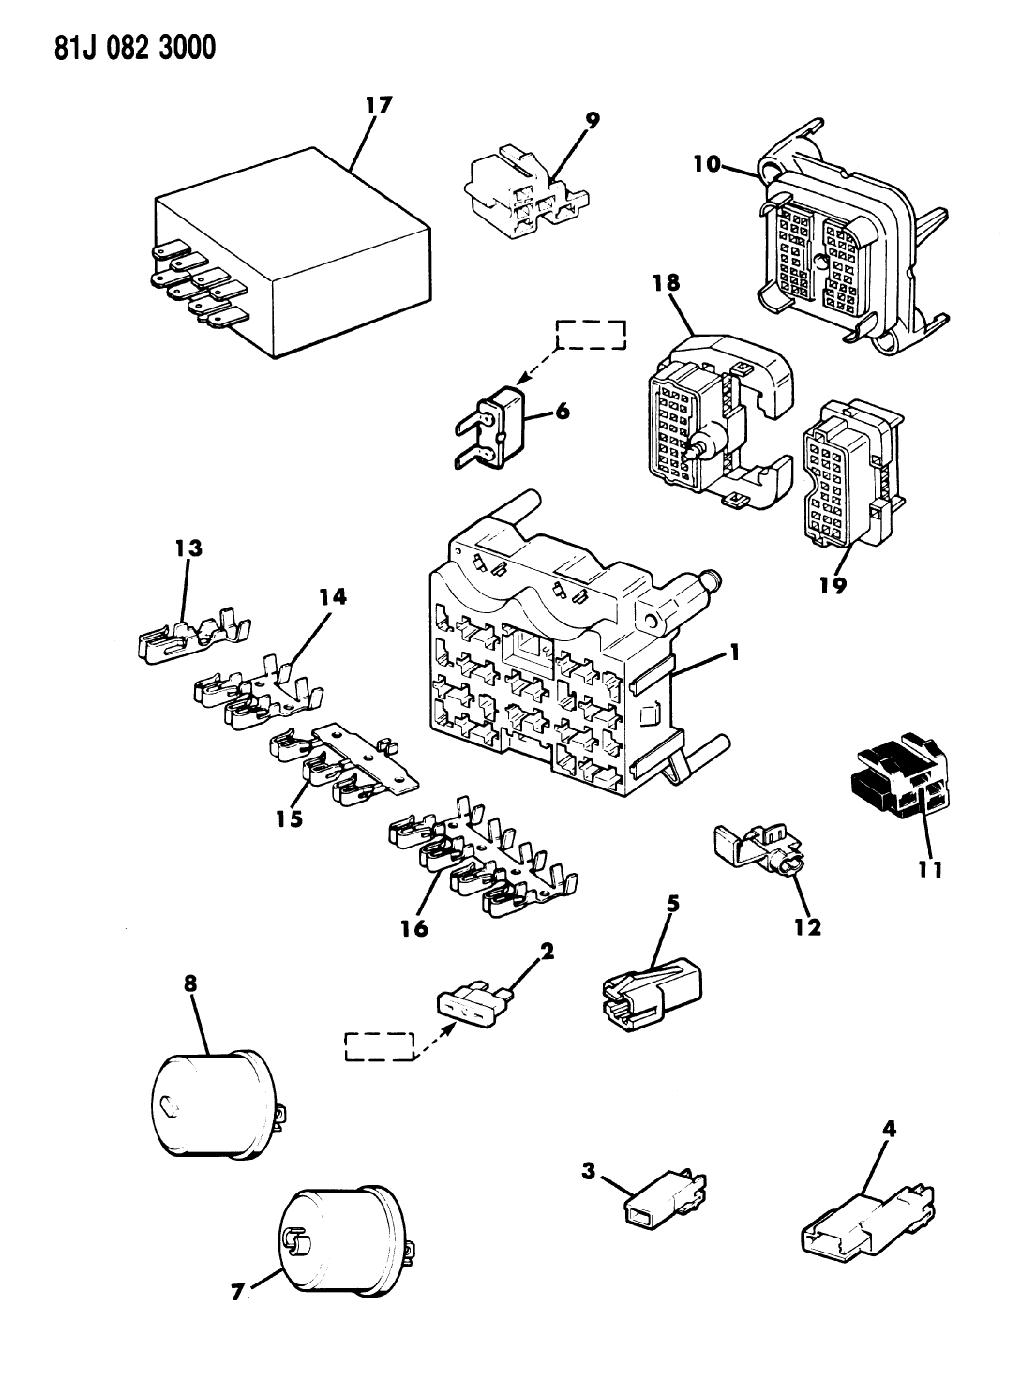 84 jeep wagoneer fuse box